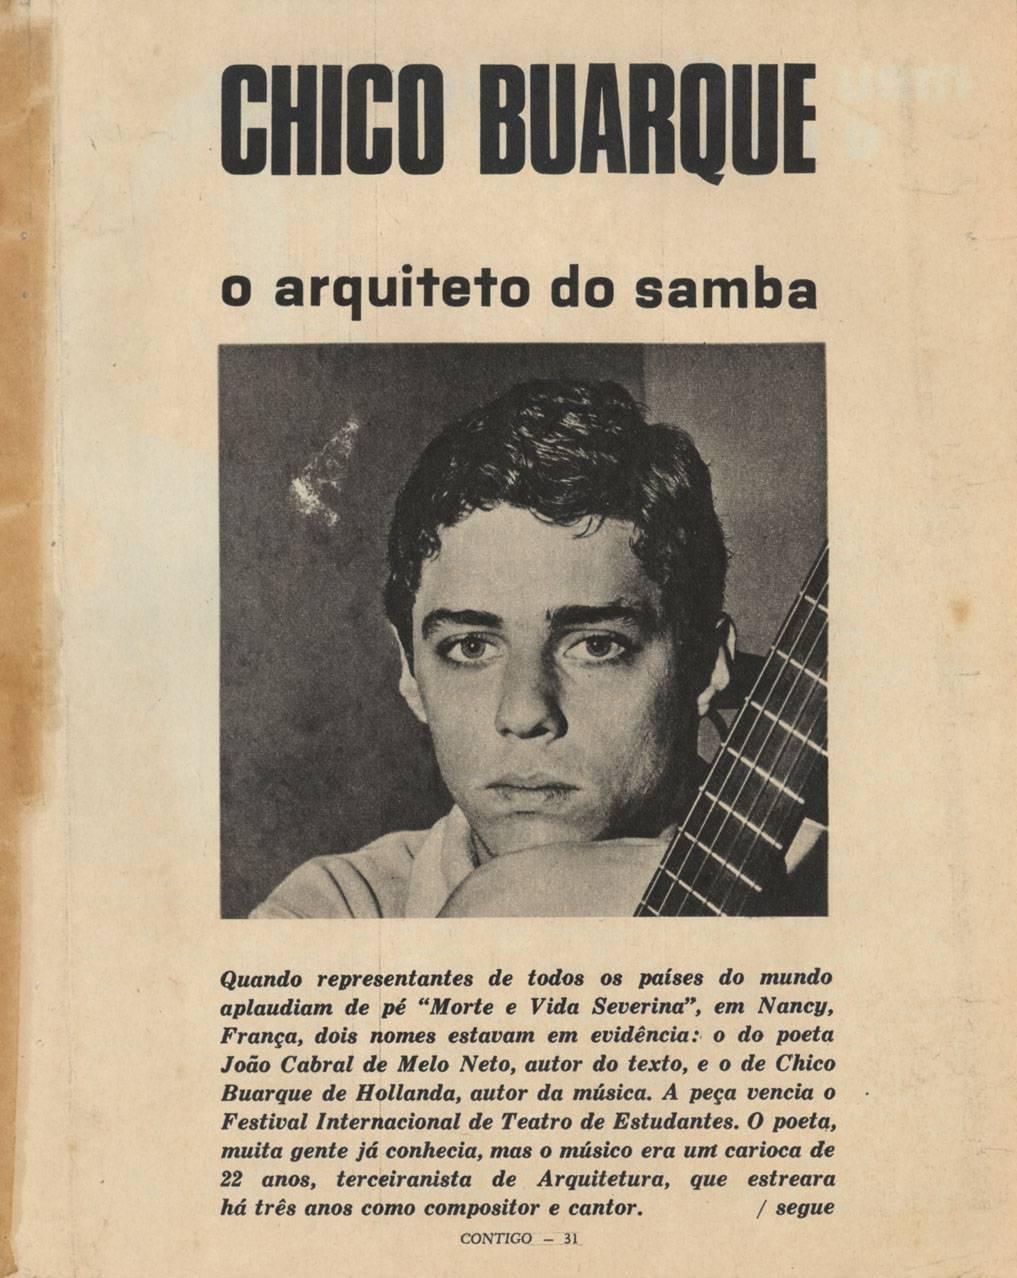 Chico Buarque estudou arquitetura